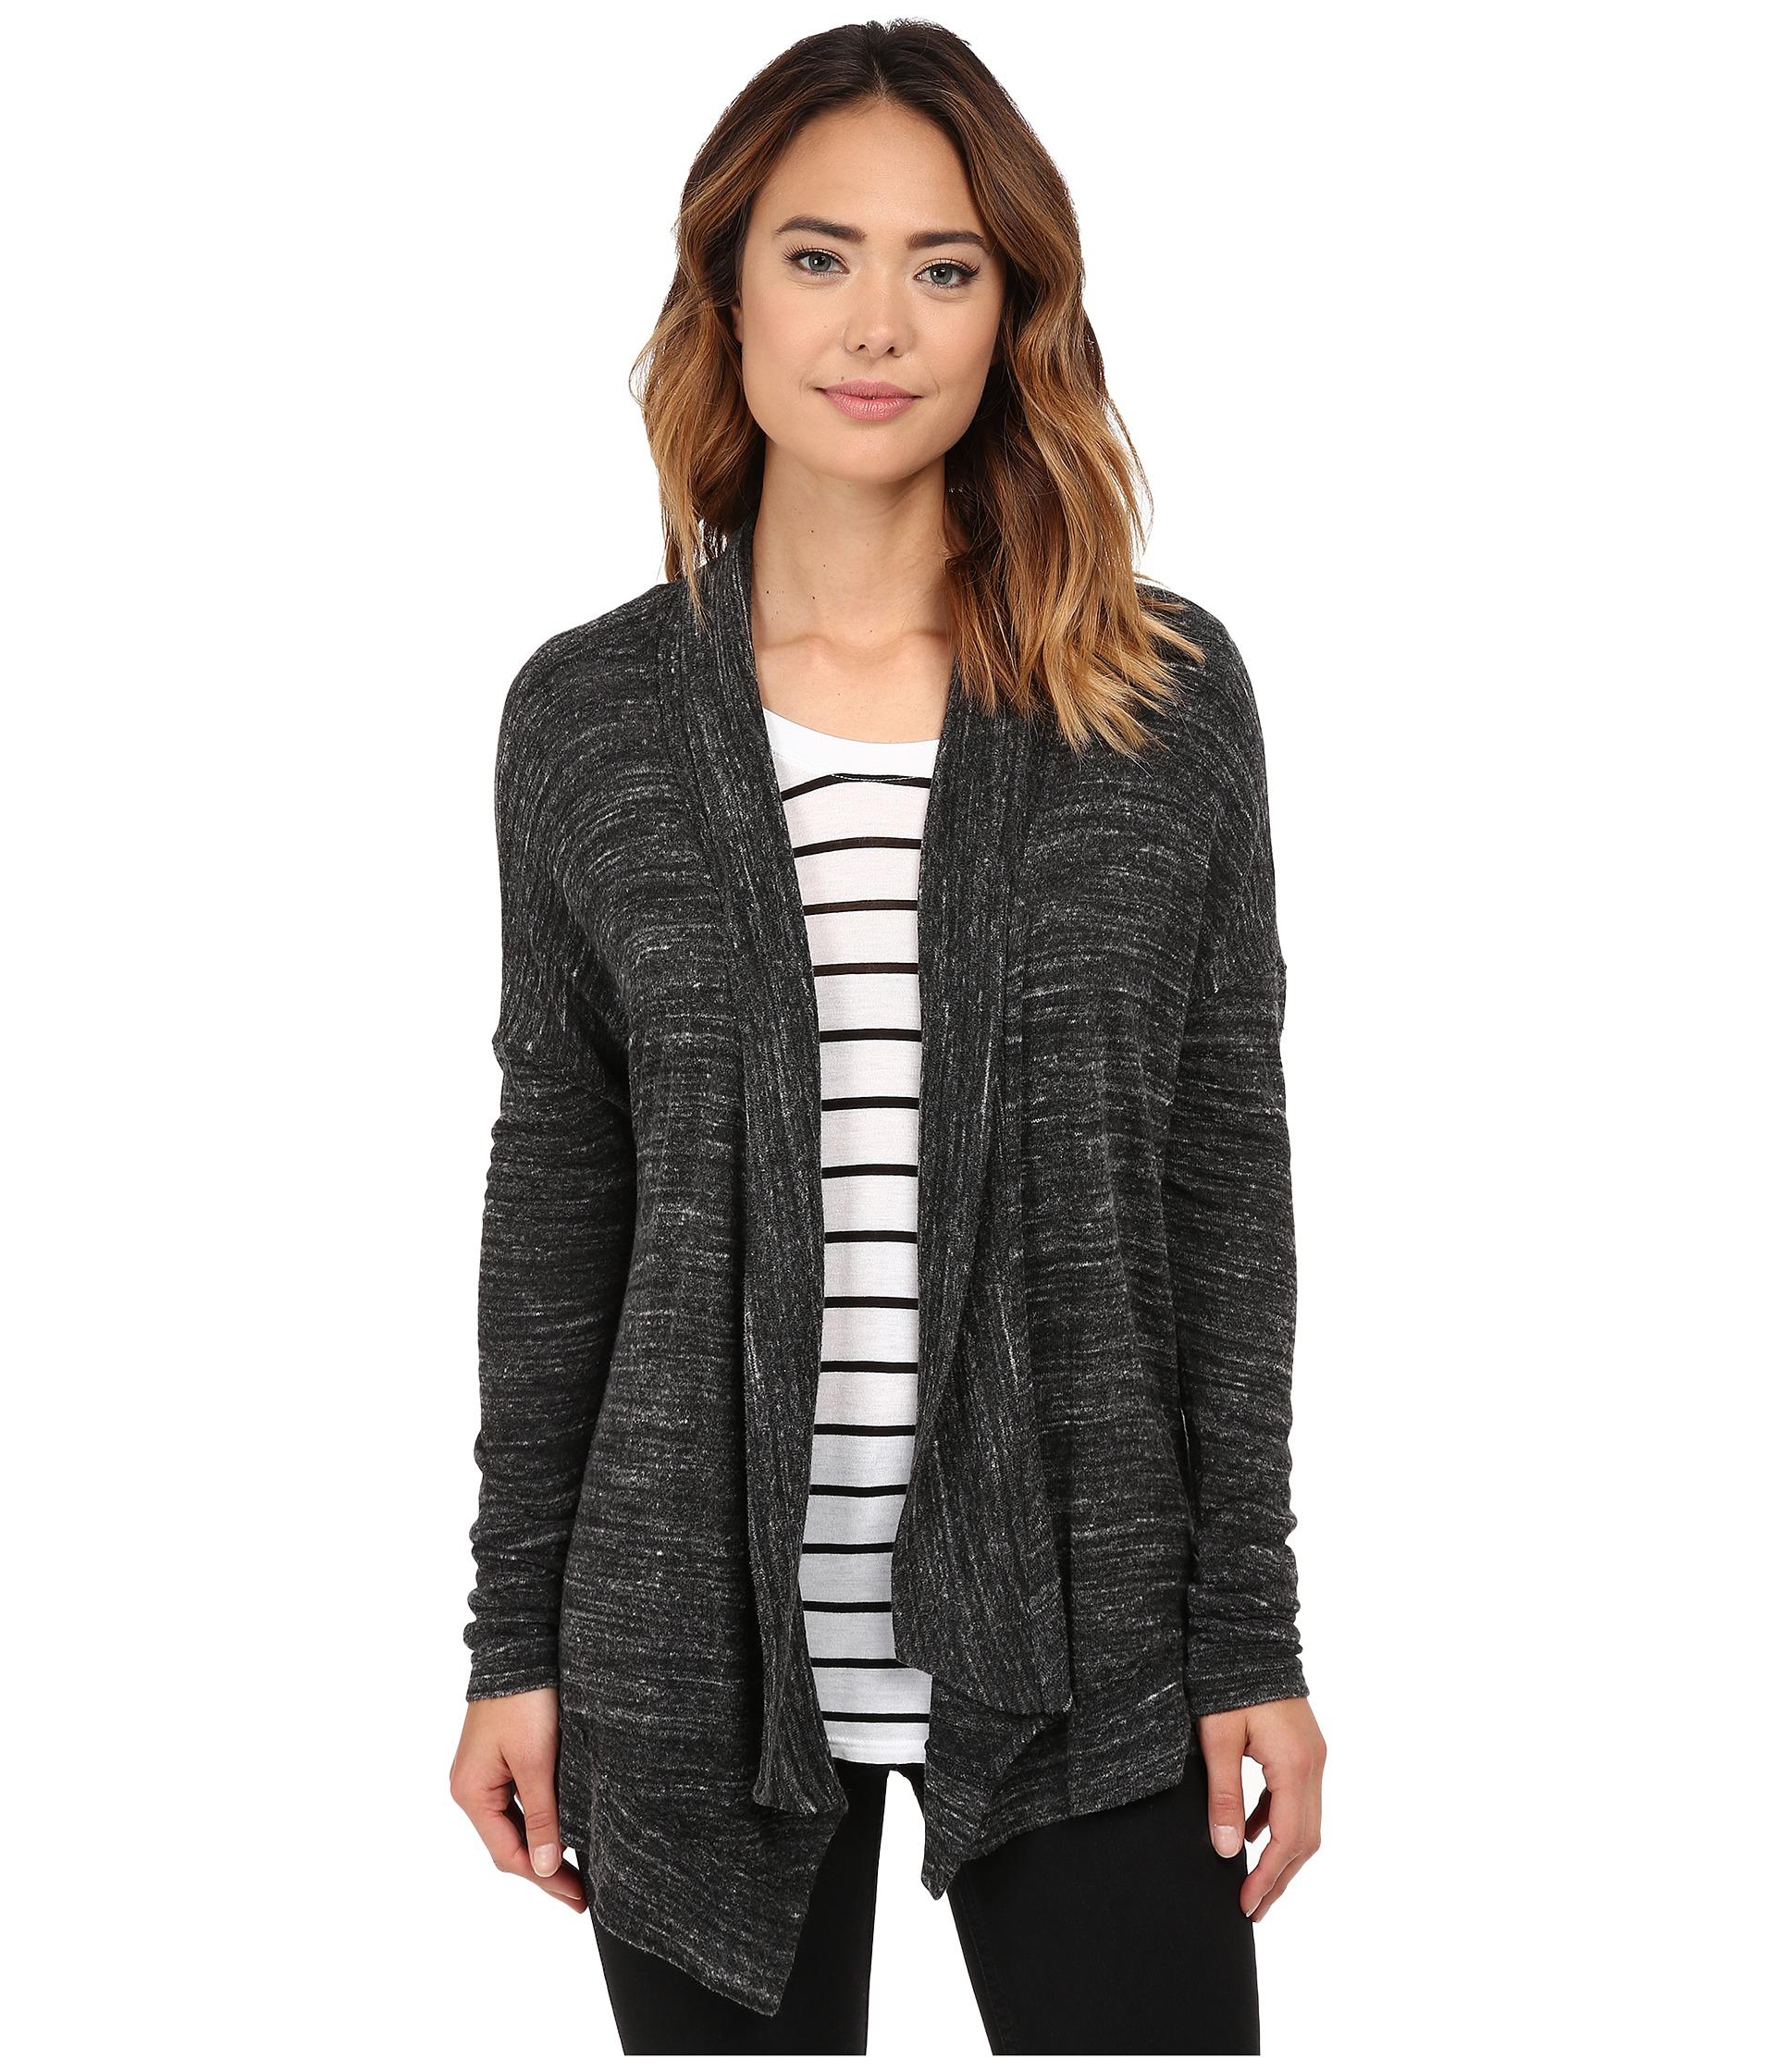 Michael stars Sweater Knit Long Sleeve Open Front Cardigan in ...